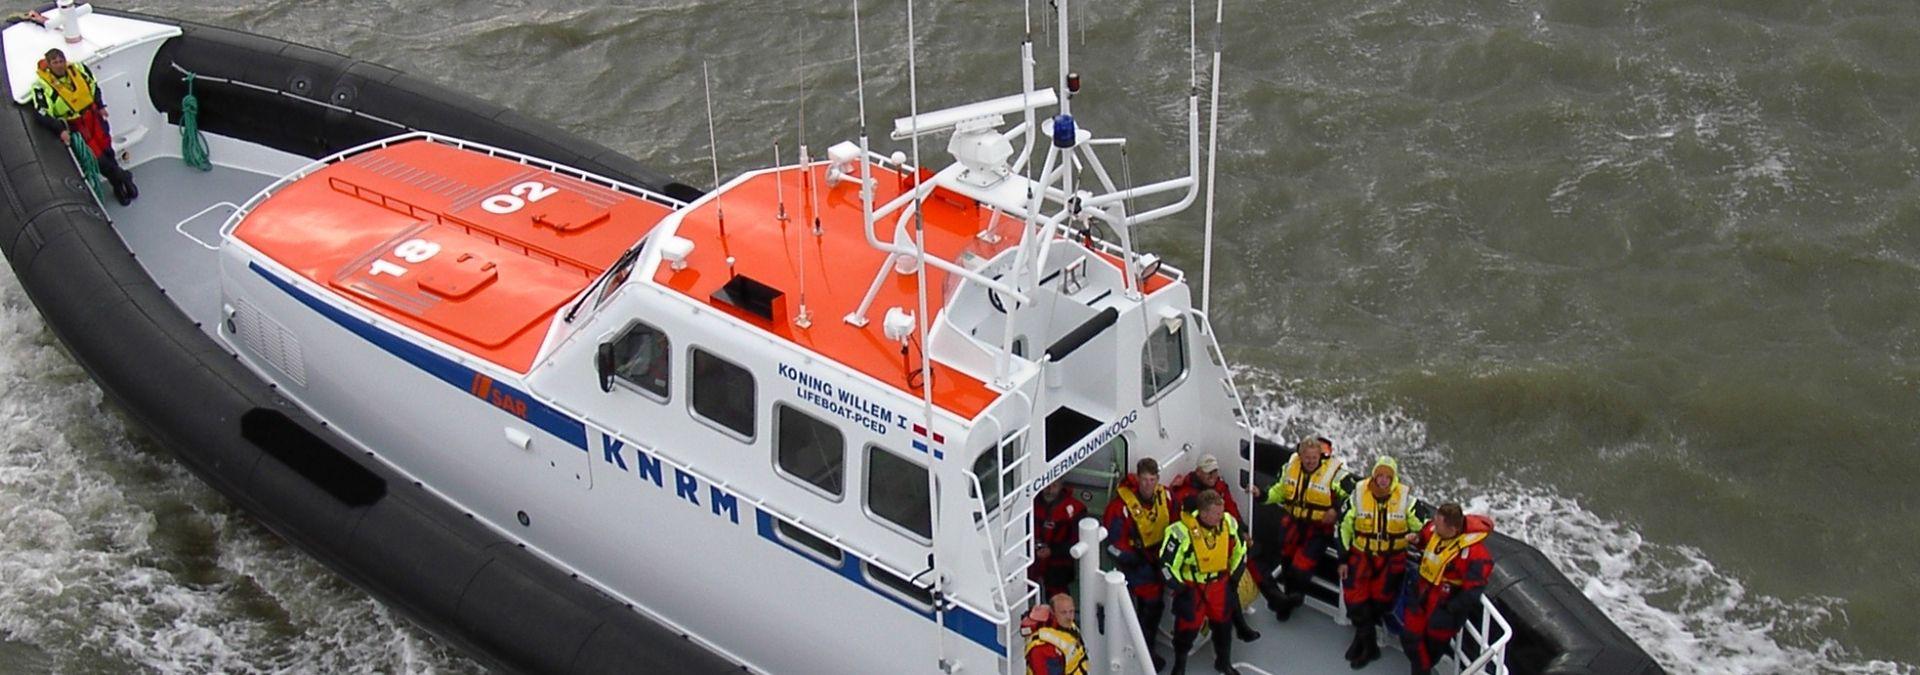 Reddingboot Koning Willem I